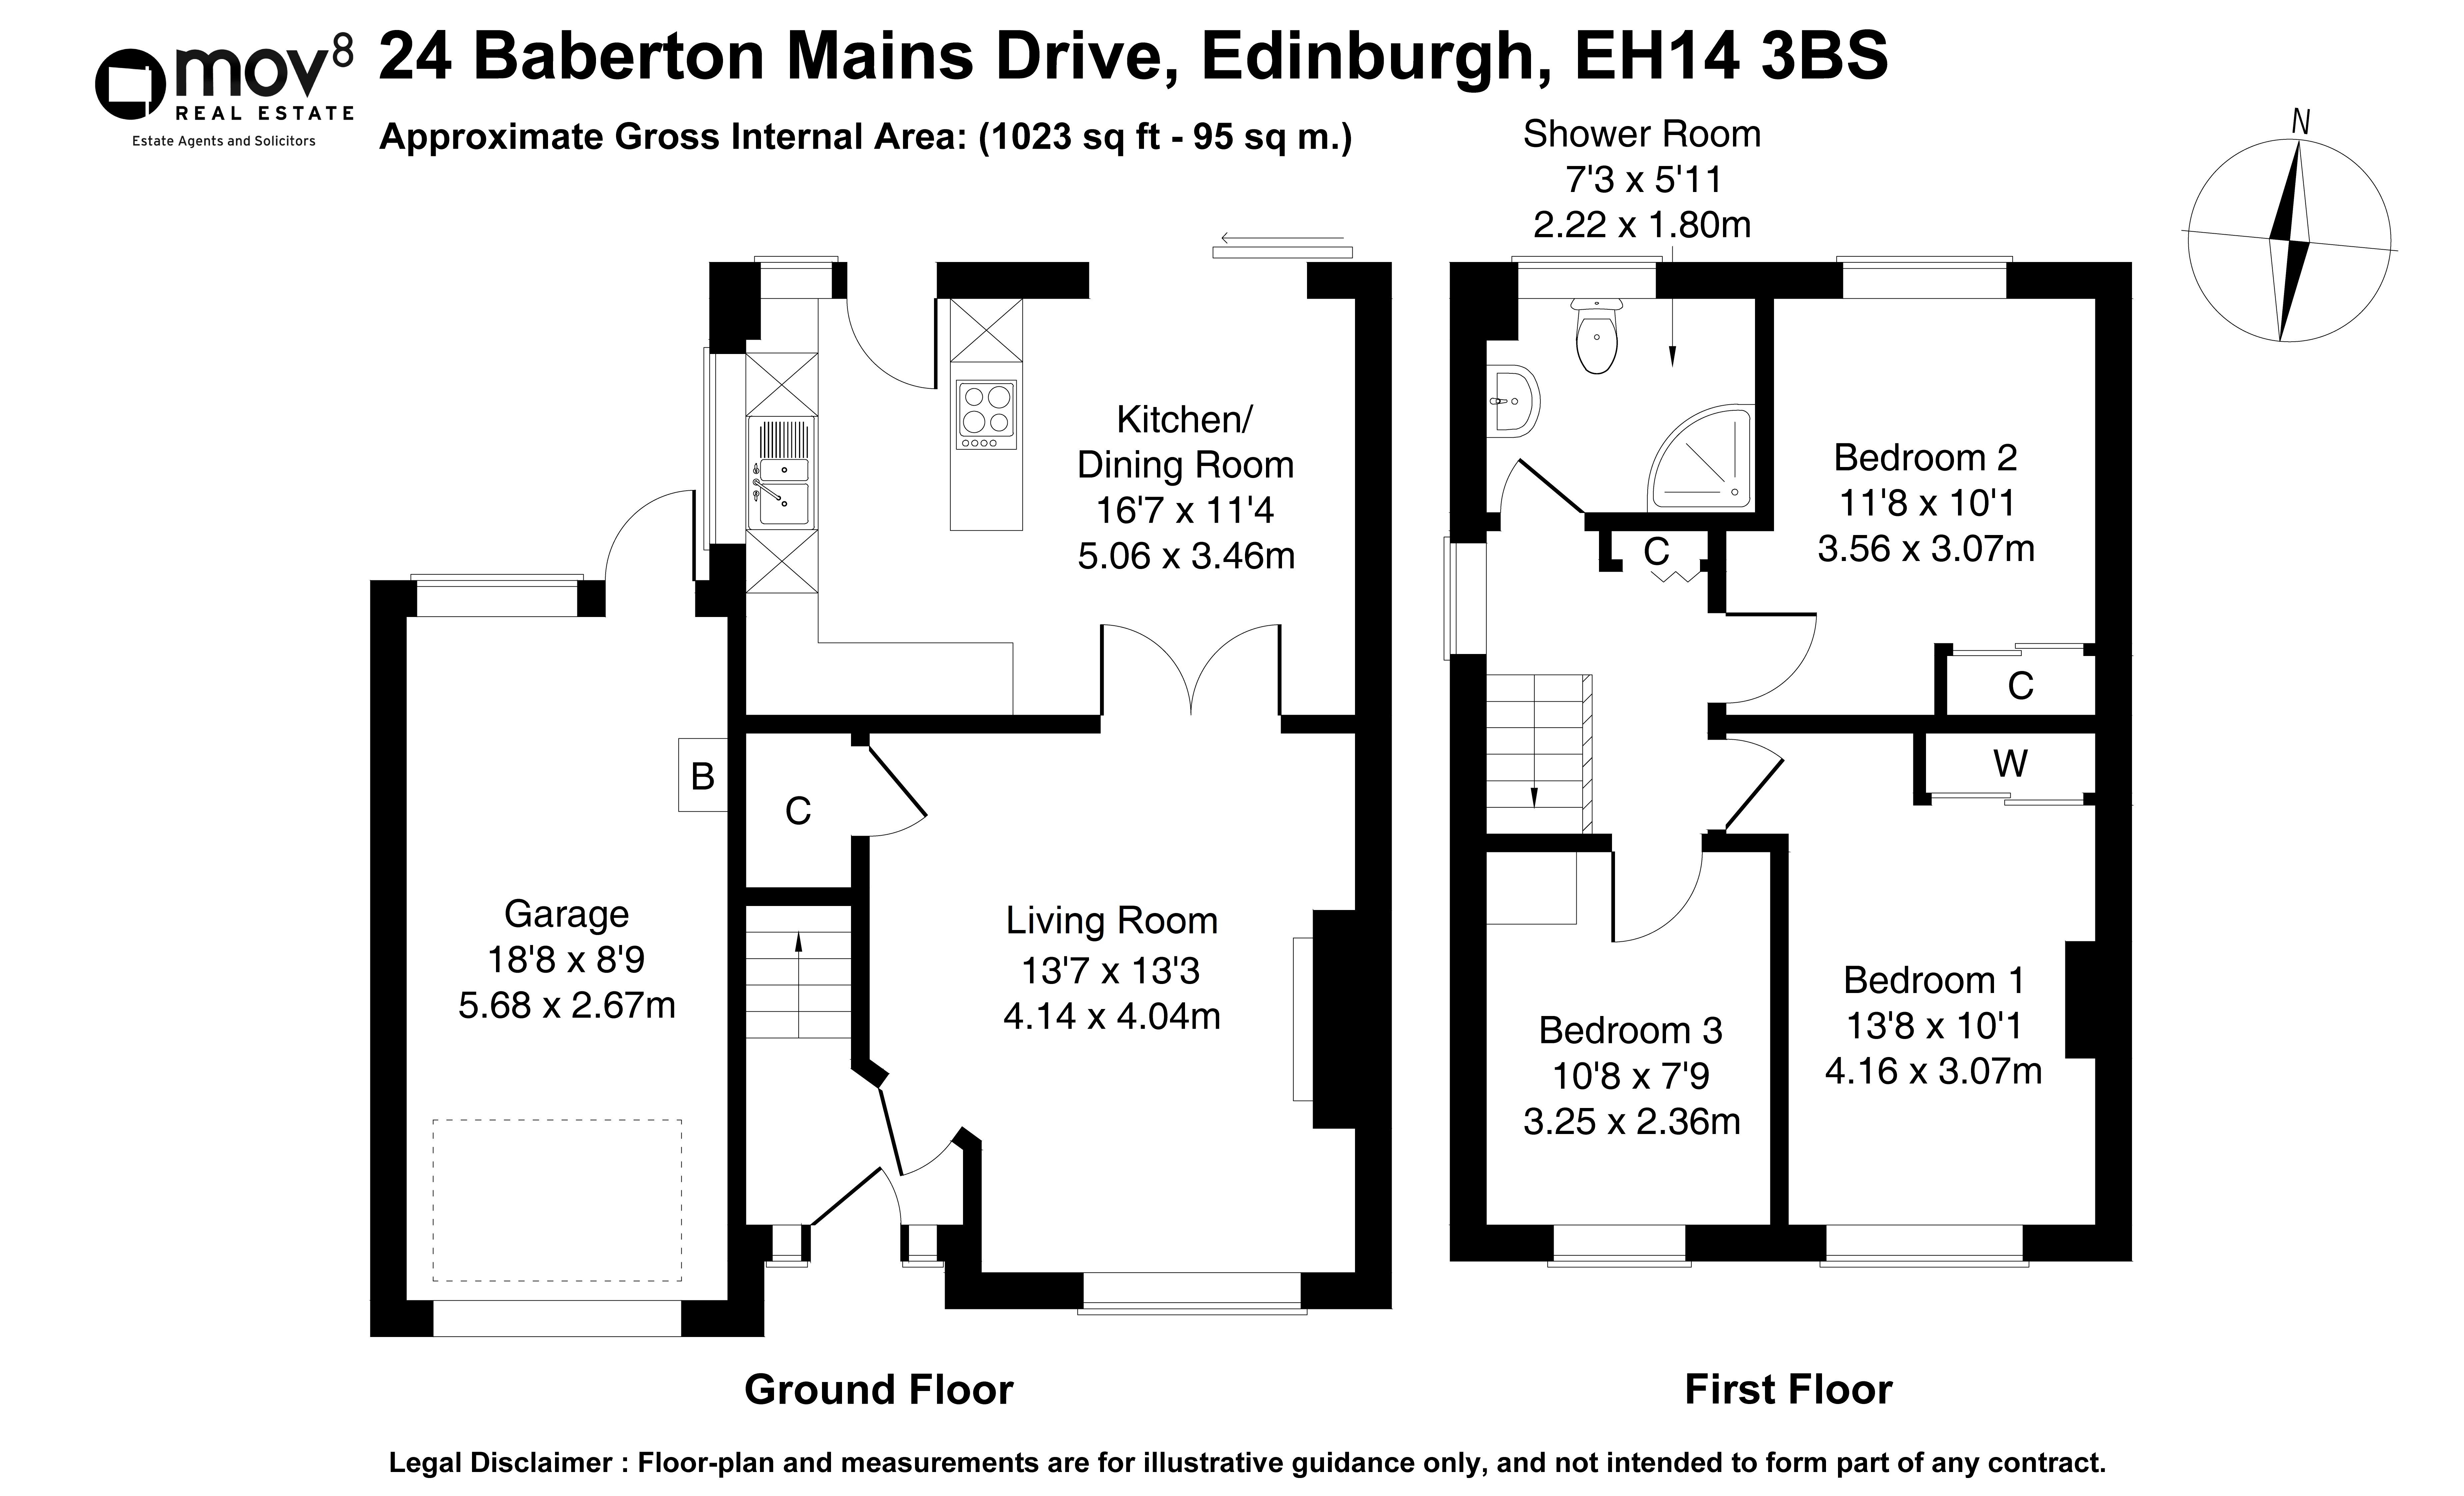 Floorplan 1 of 24 Baberton Mains Drive, Baberton, Edinburgh, EH14 3BS